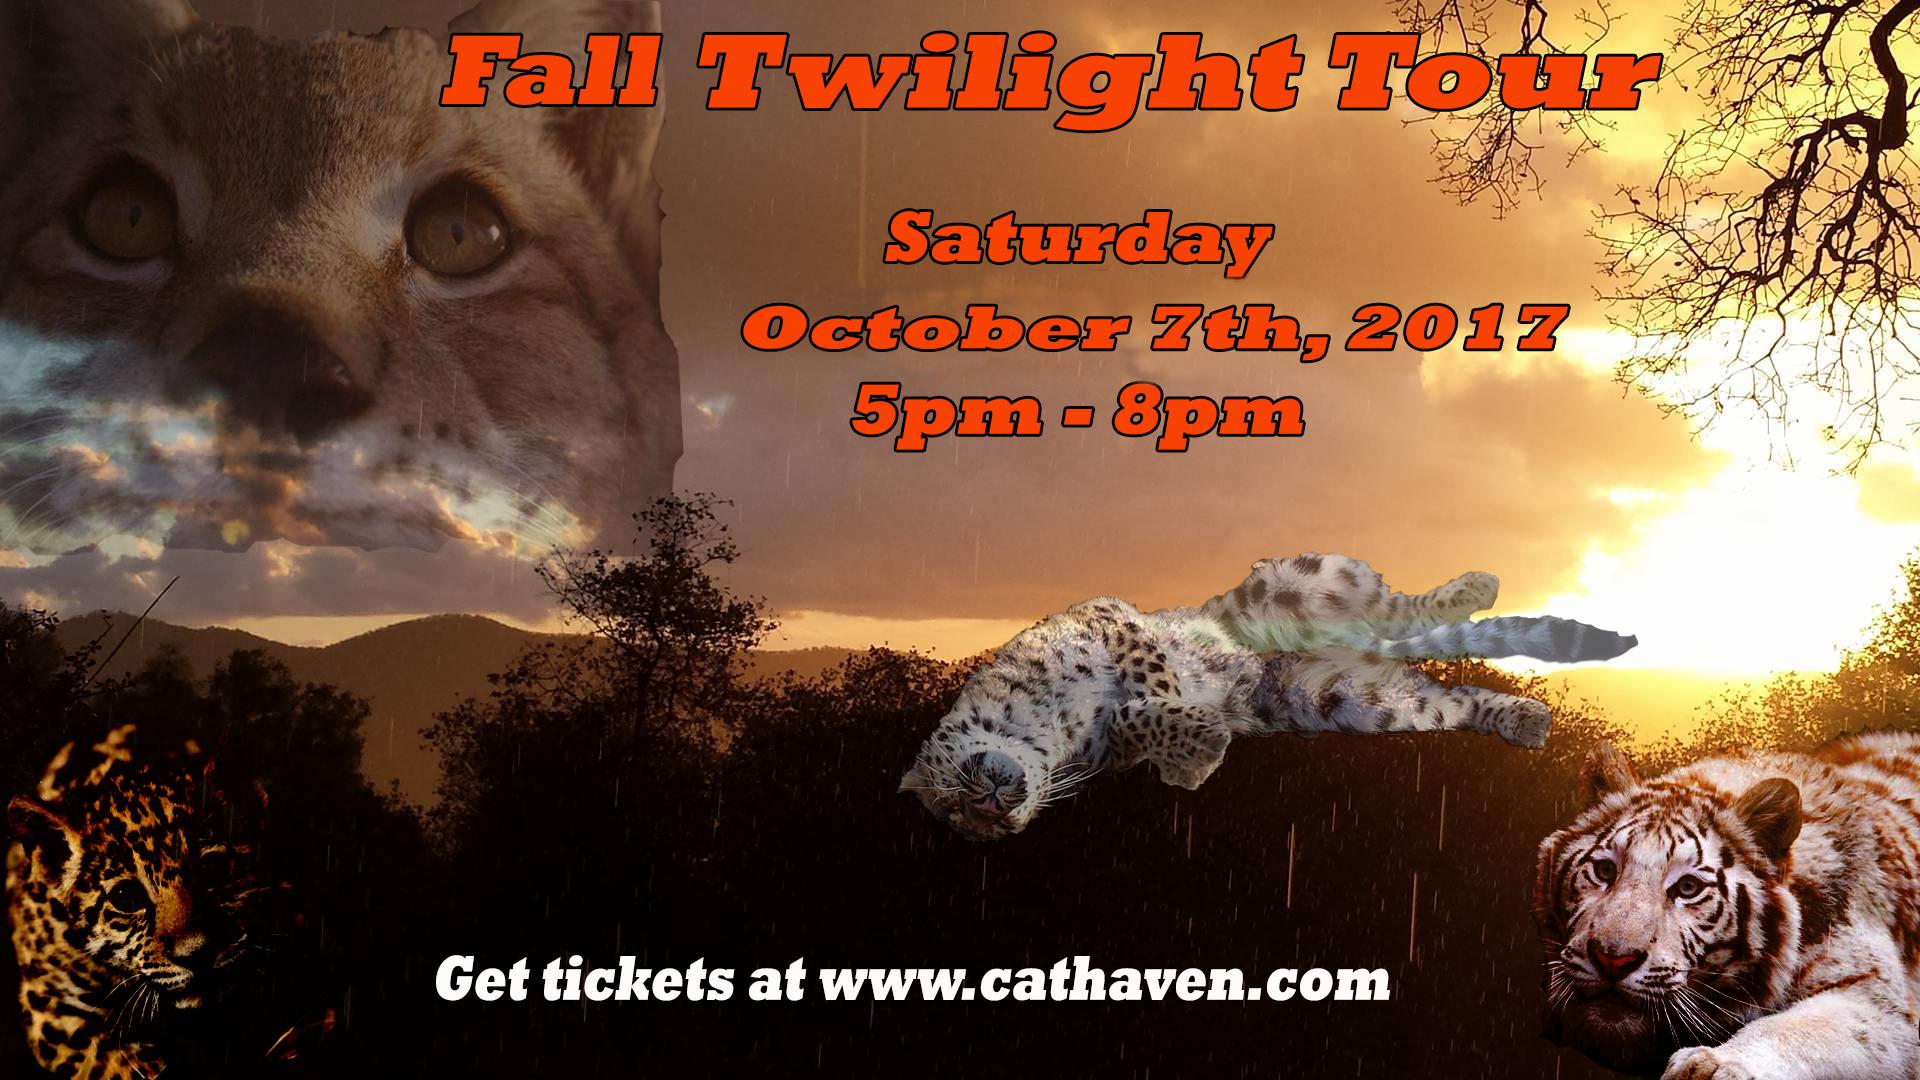 twilight tour fall.jpg